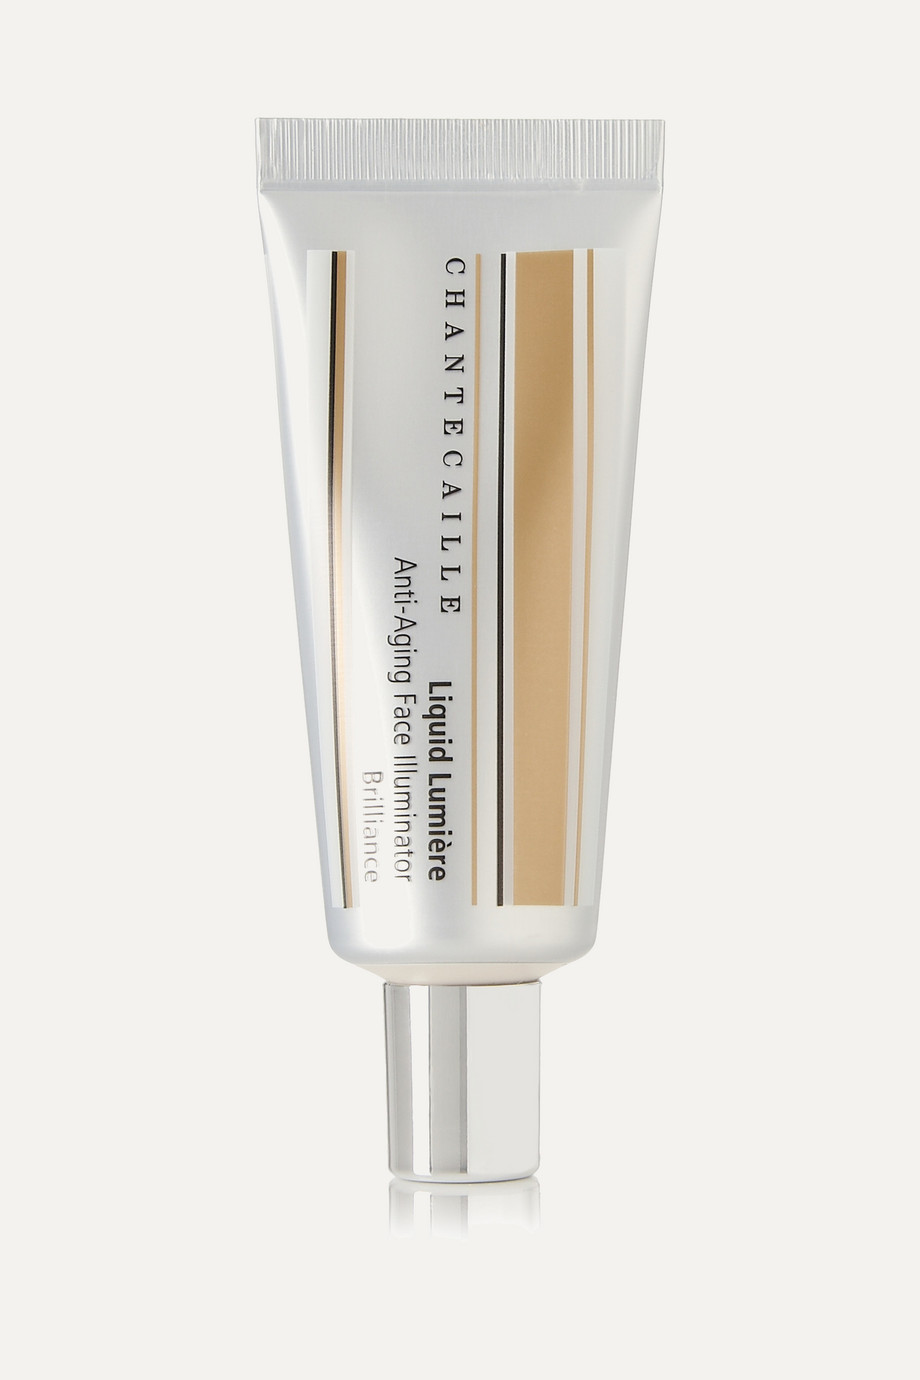 Chantecaille Liquid Lumière Anti-Aging Illuminator - Brilliance, 23ml